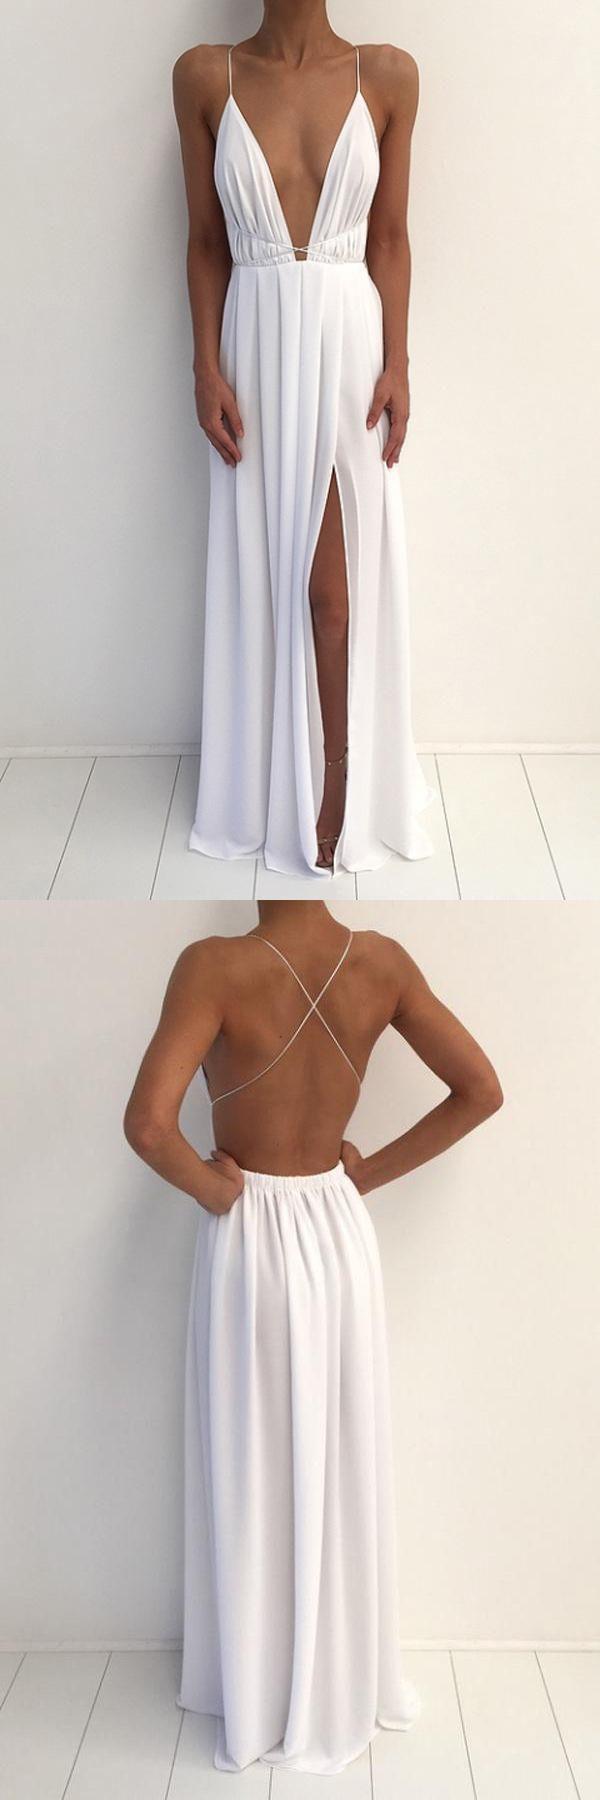 Classy simple aline deep vneck long white chiffon prom dresses